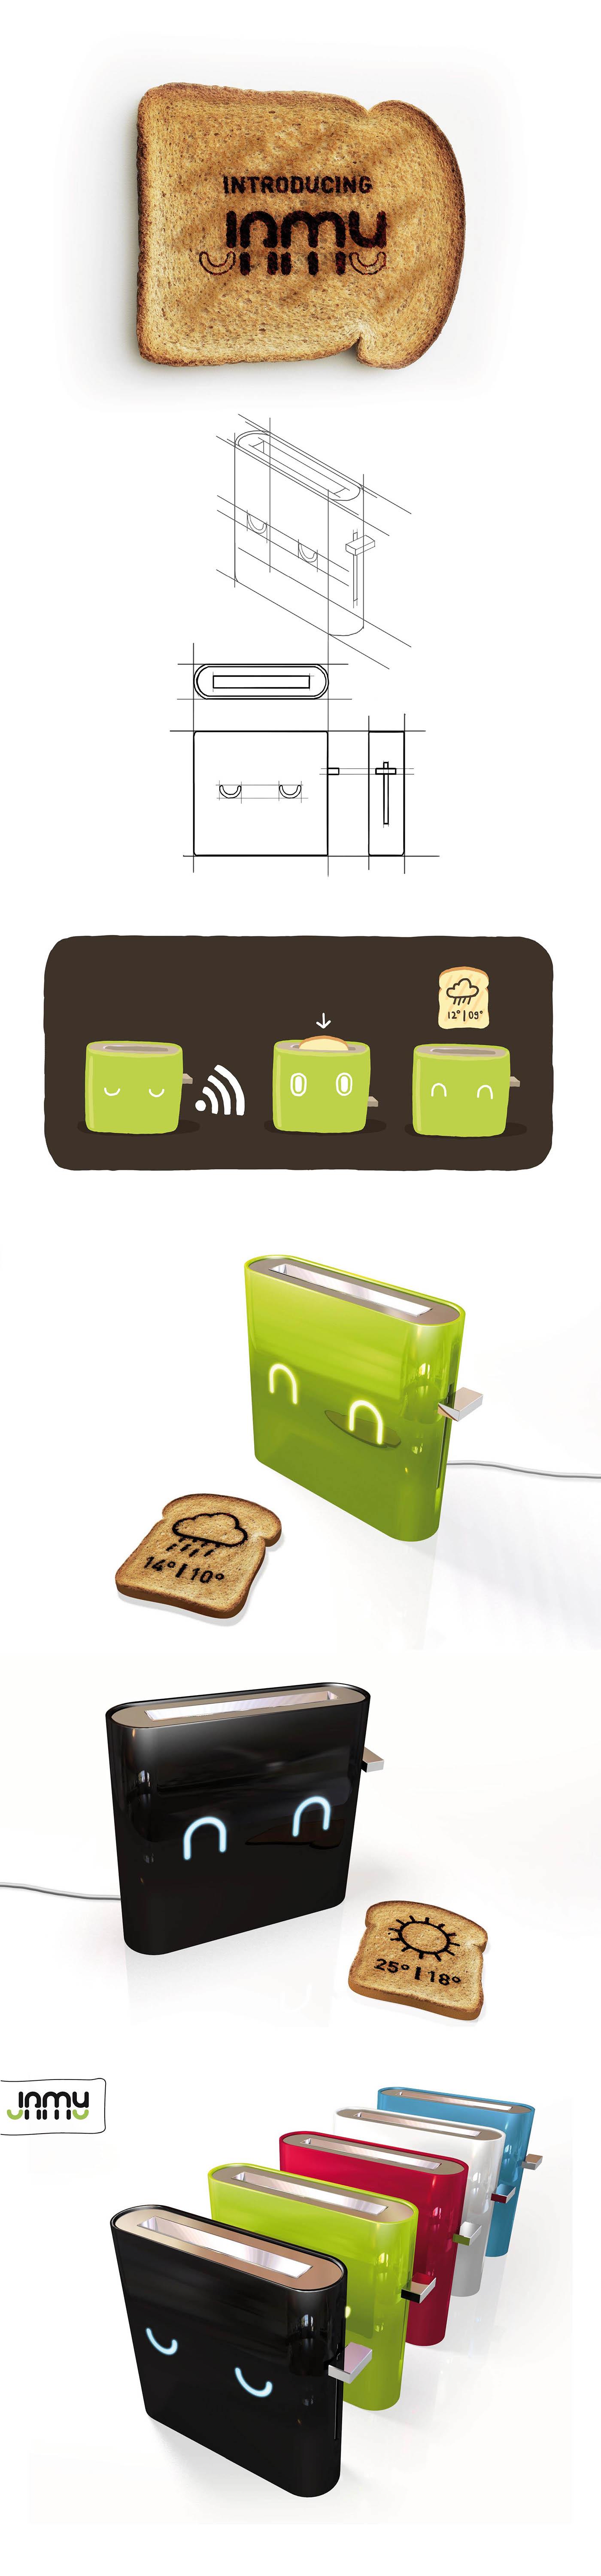 on gallery jamy behance smart toaster